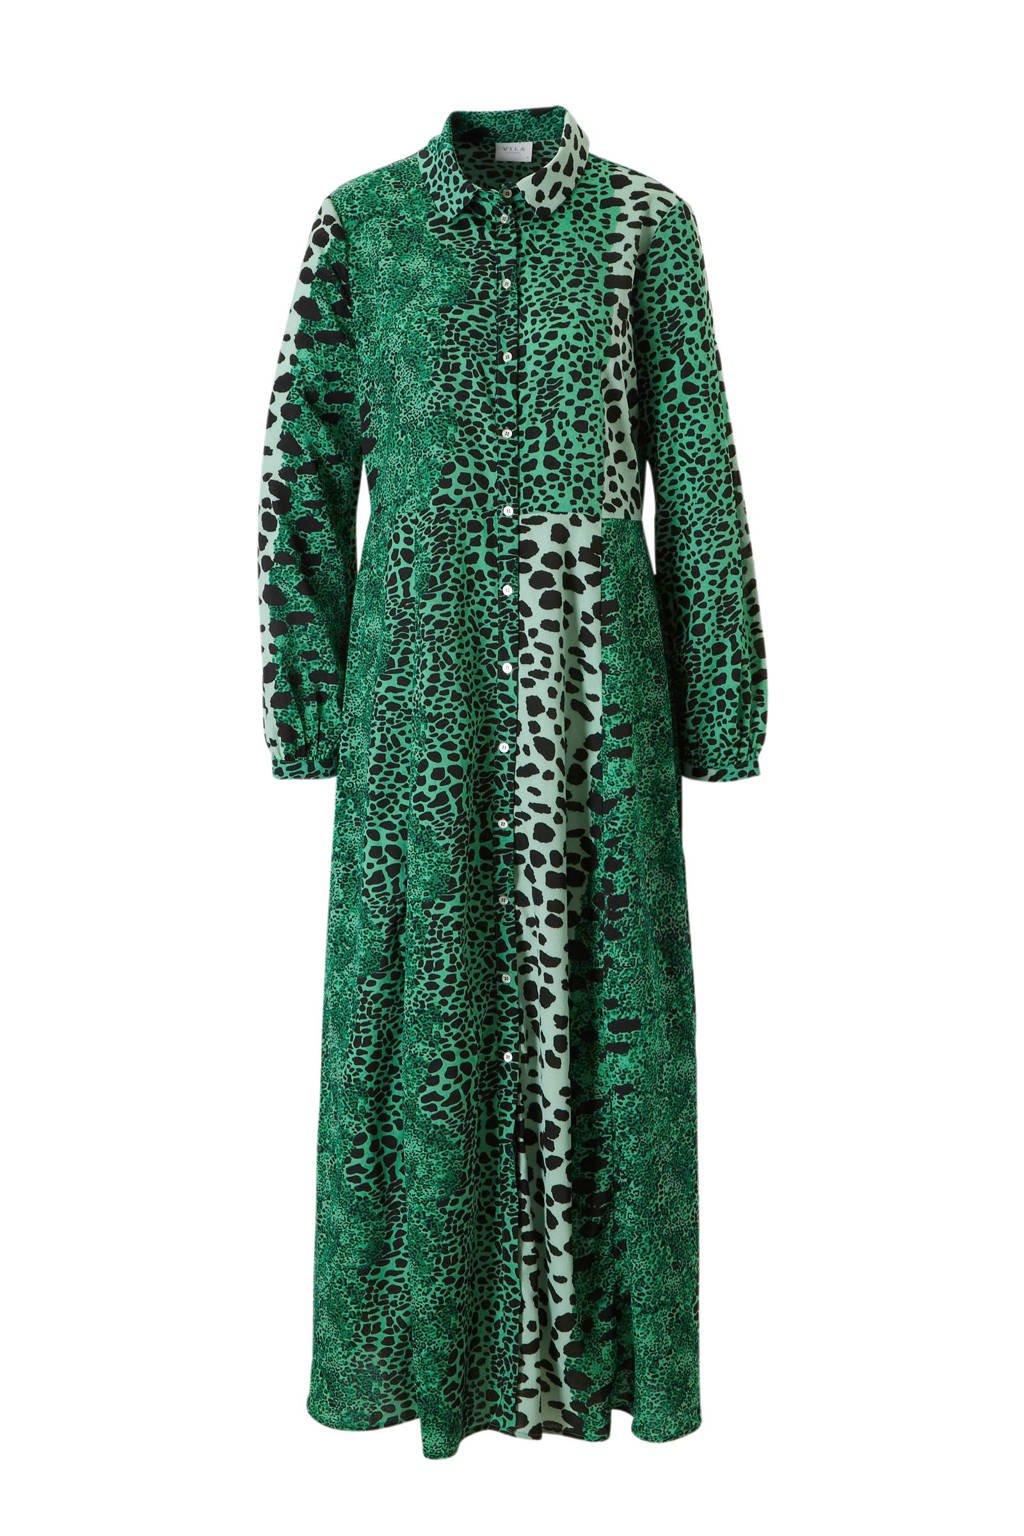 VILA blousejurk met panterprint groen, Groen/zwart